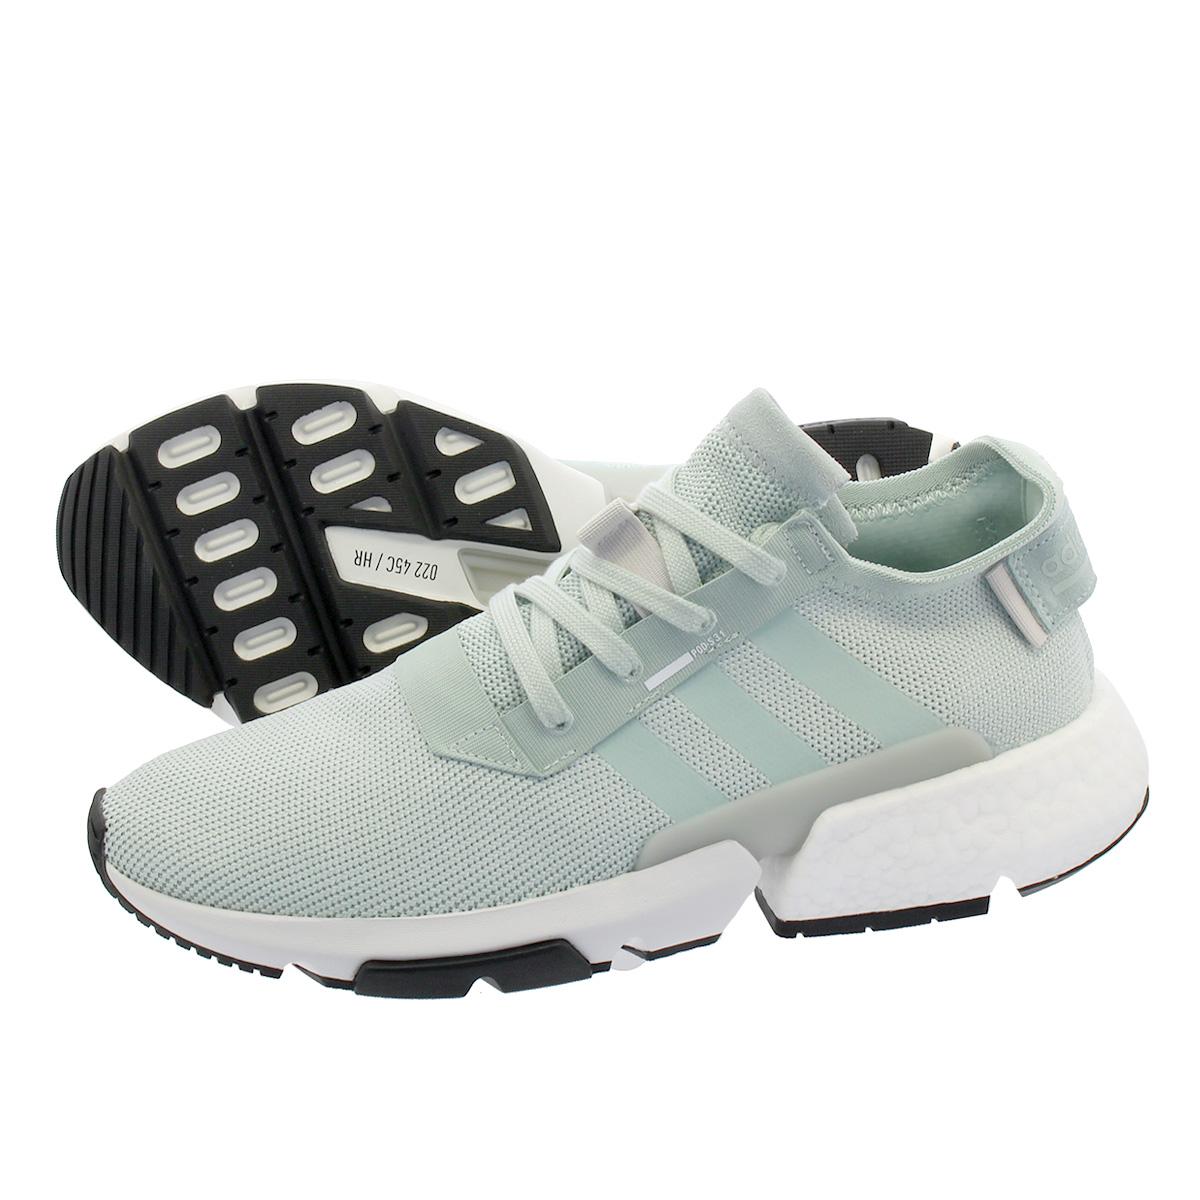 adidas POD-S3.1 アディダス POD-S3.1 VAPOR GREEN/VAPOR GREEN/GREY ONE b37368